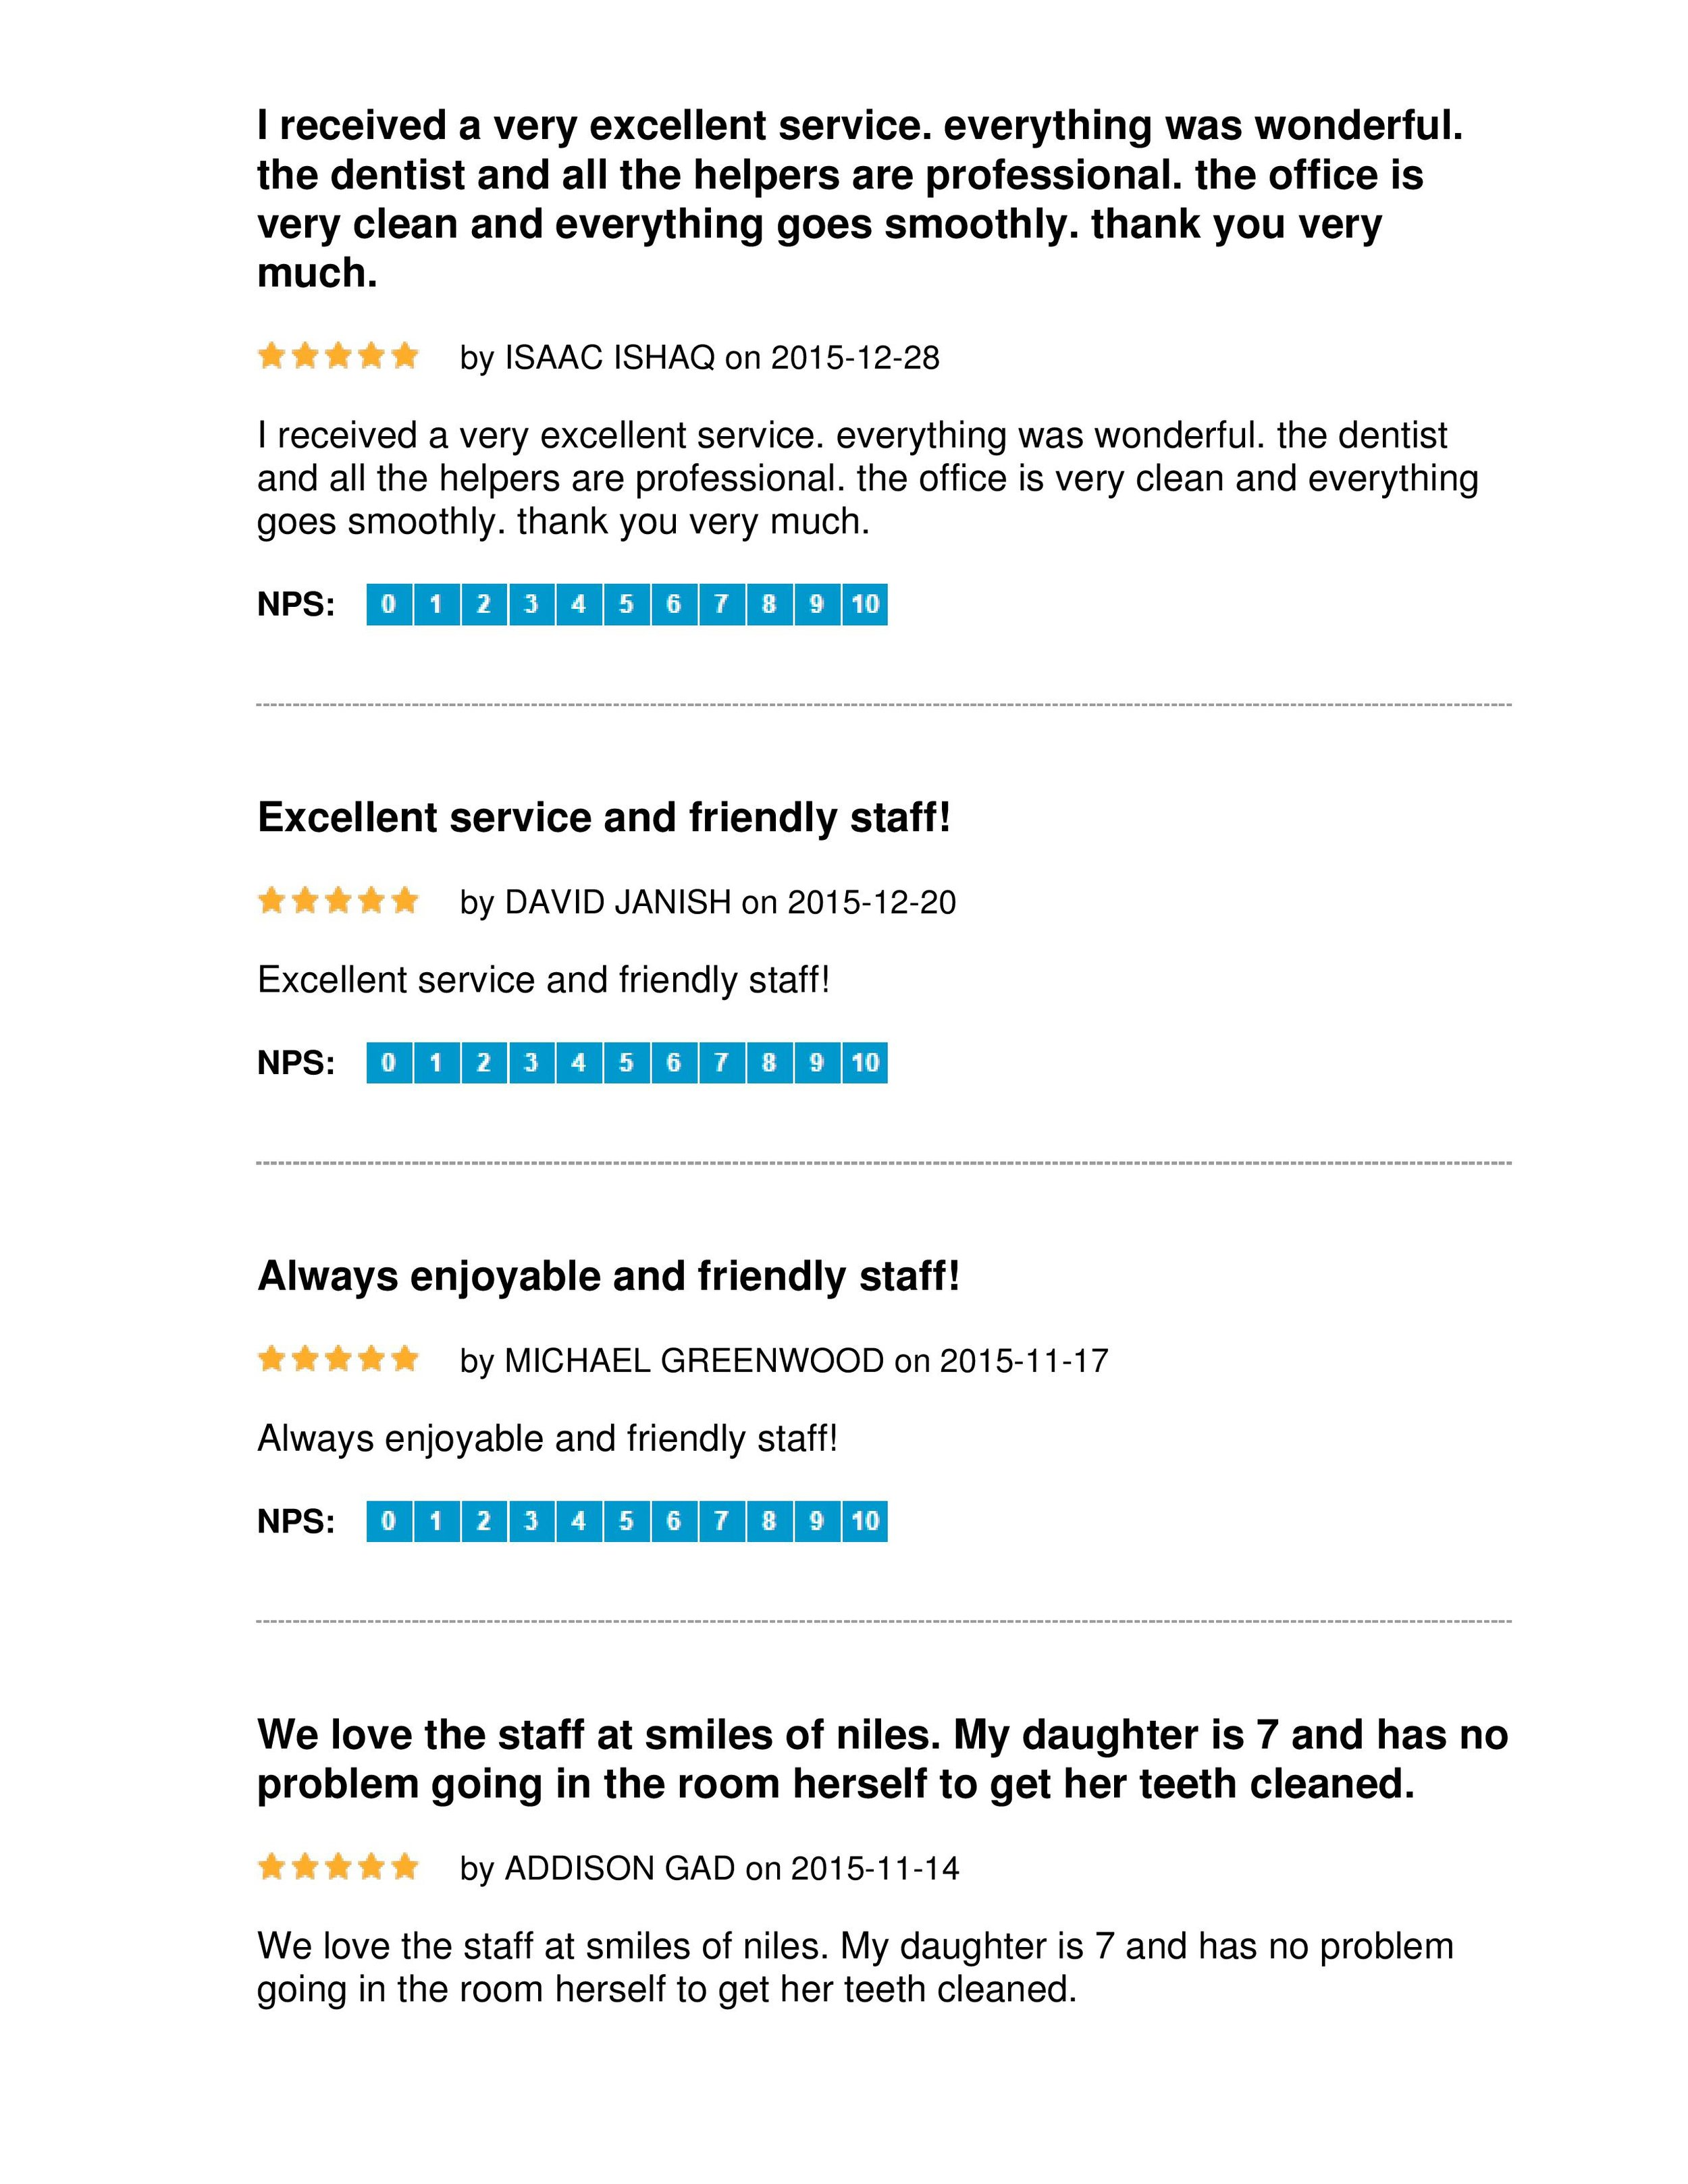 smiles of niles demandforce reviews-page-004.jpg